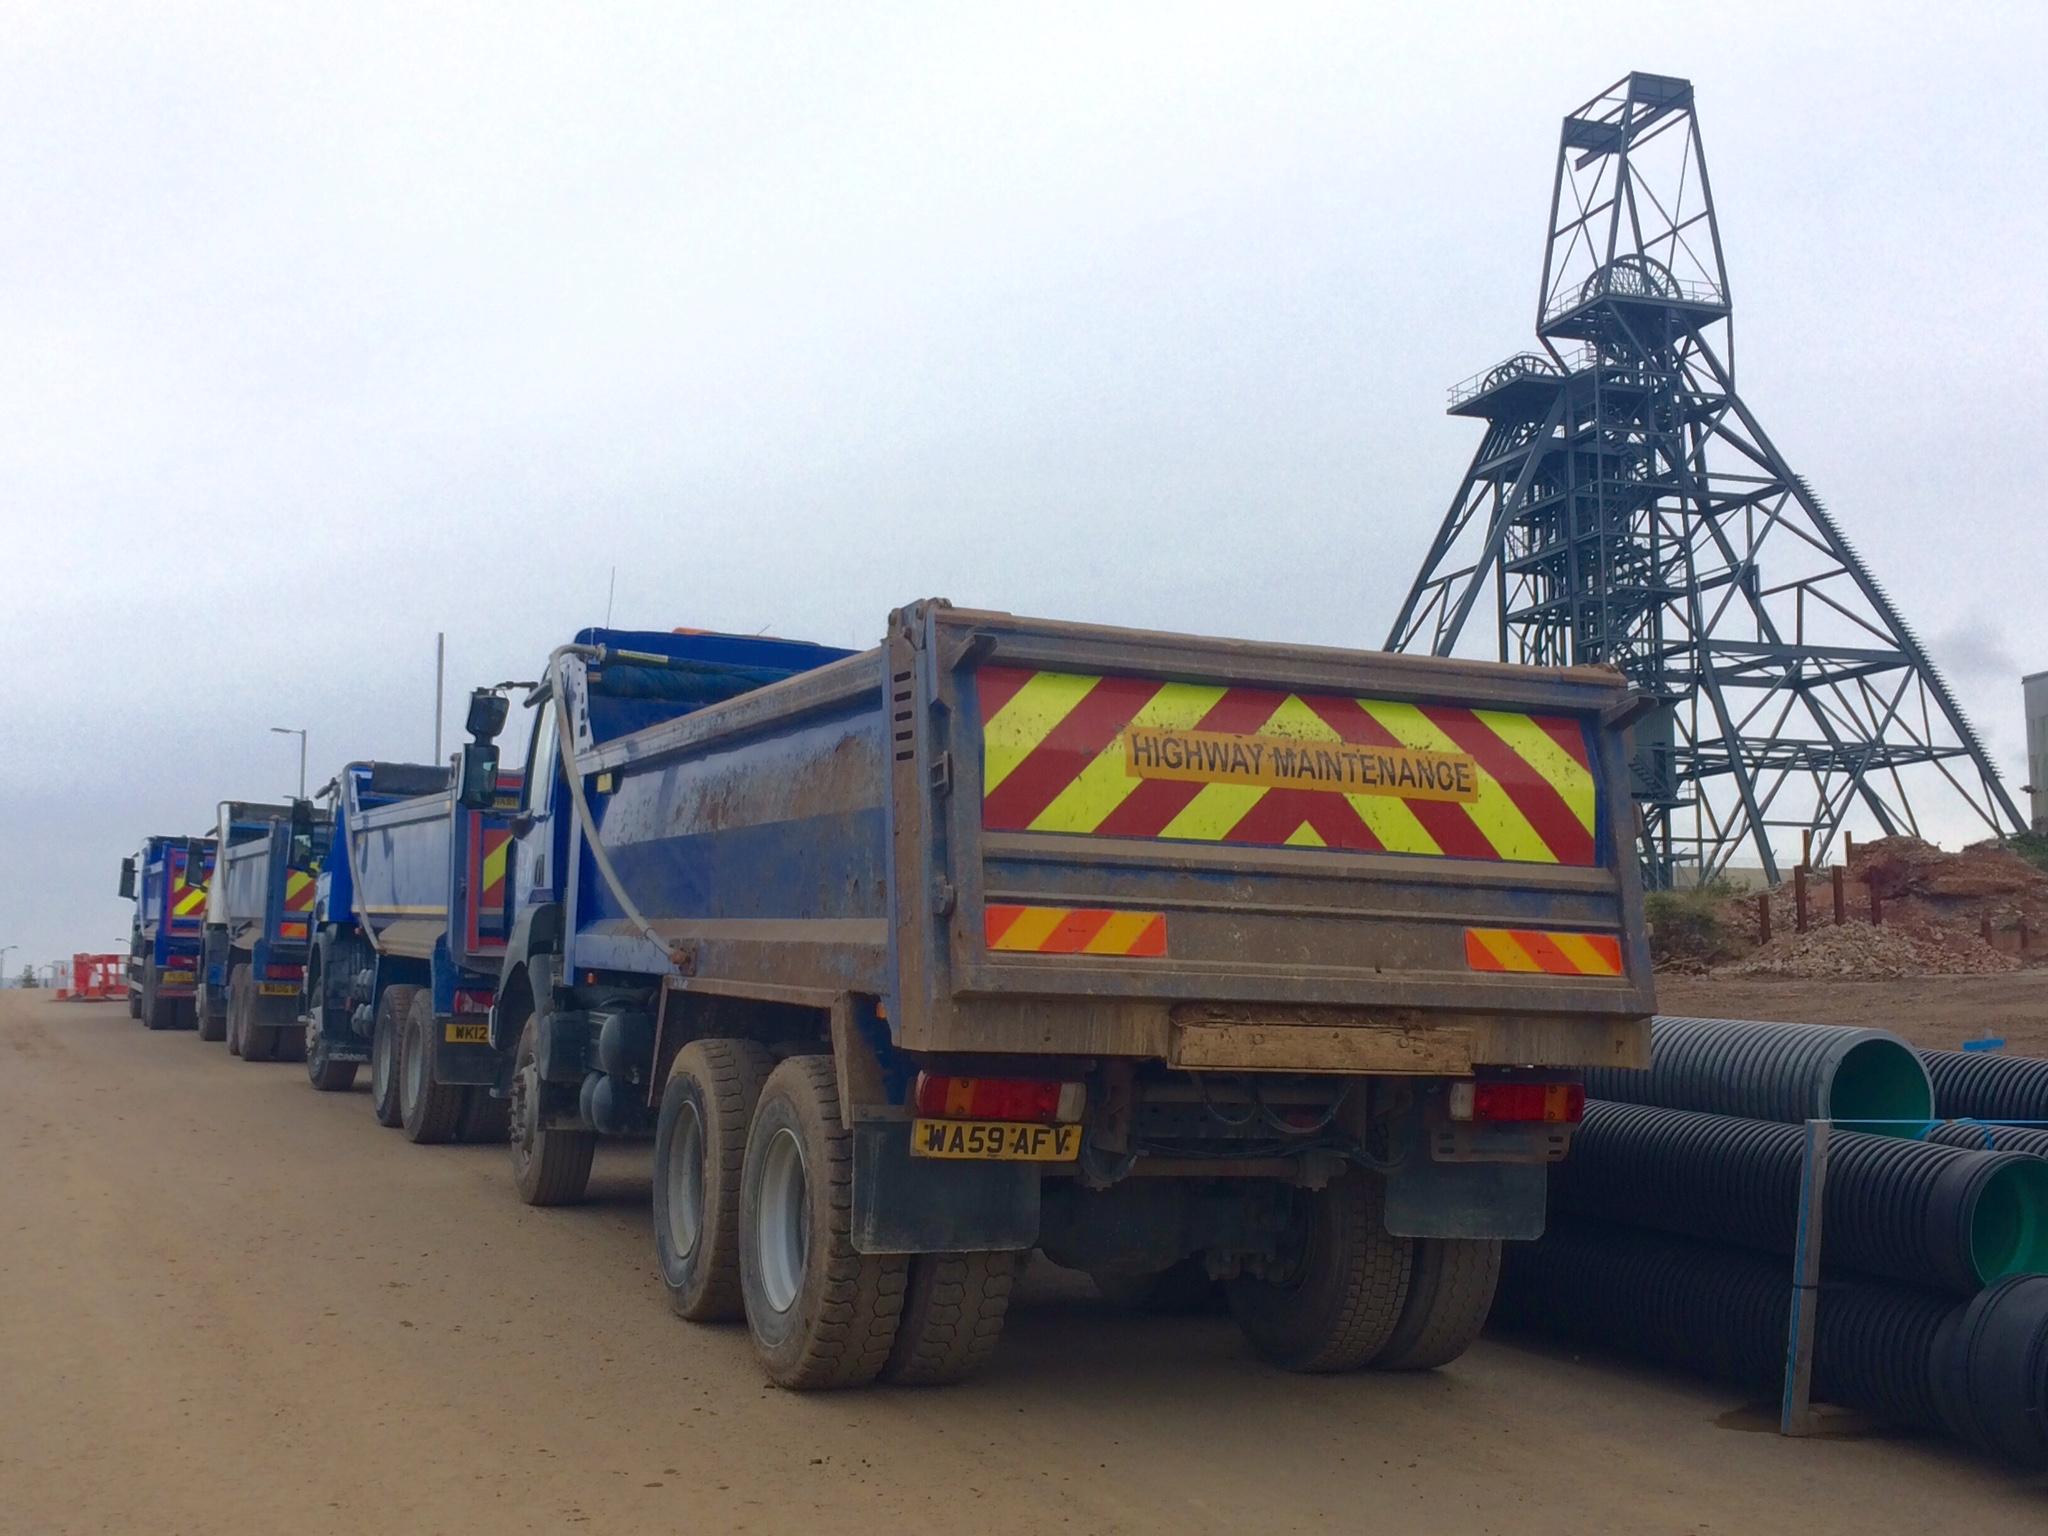 South Crofty Mine